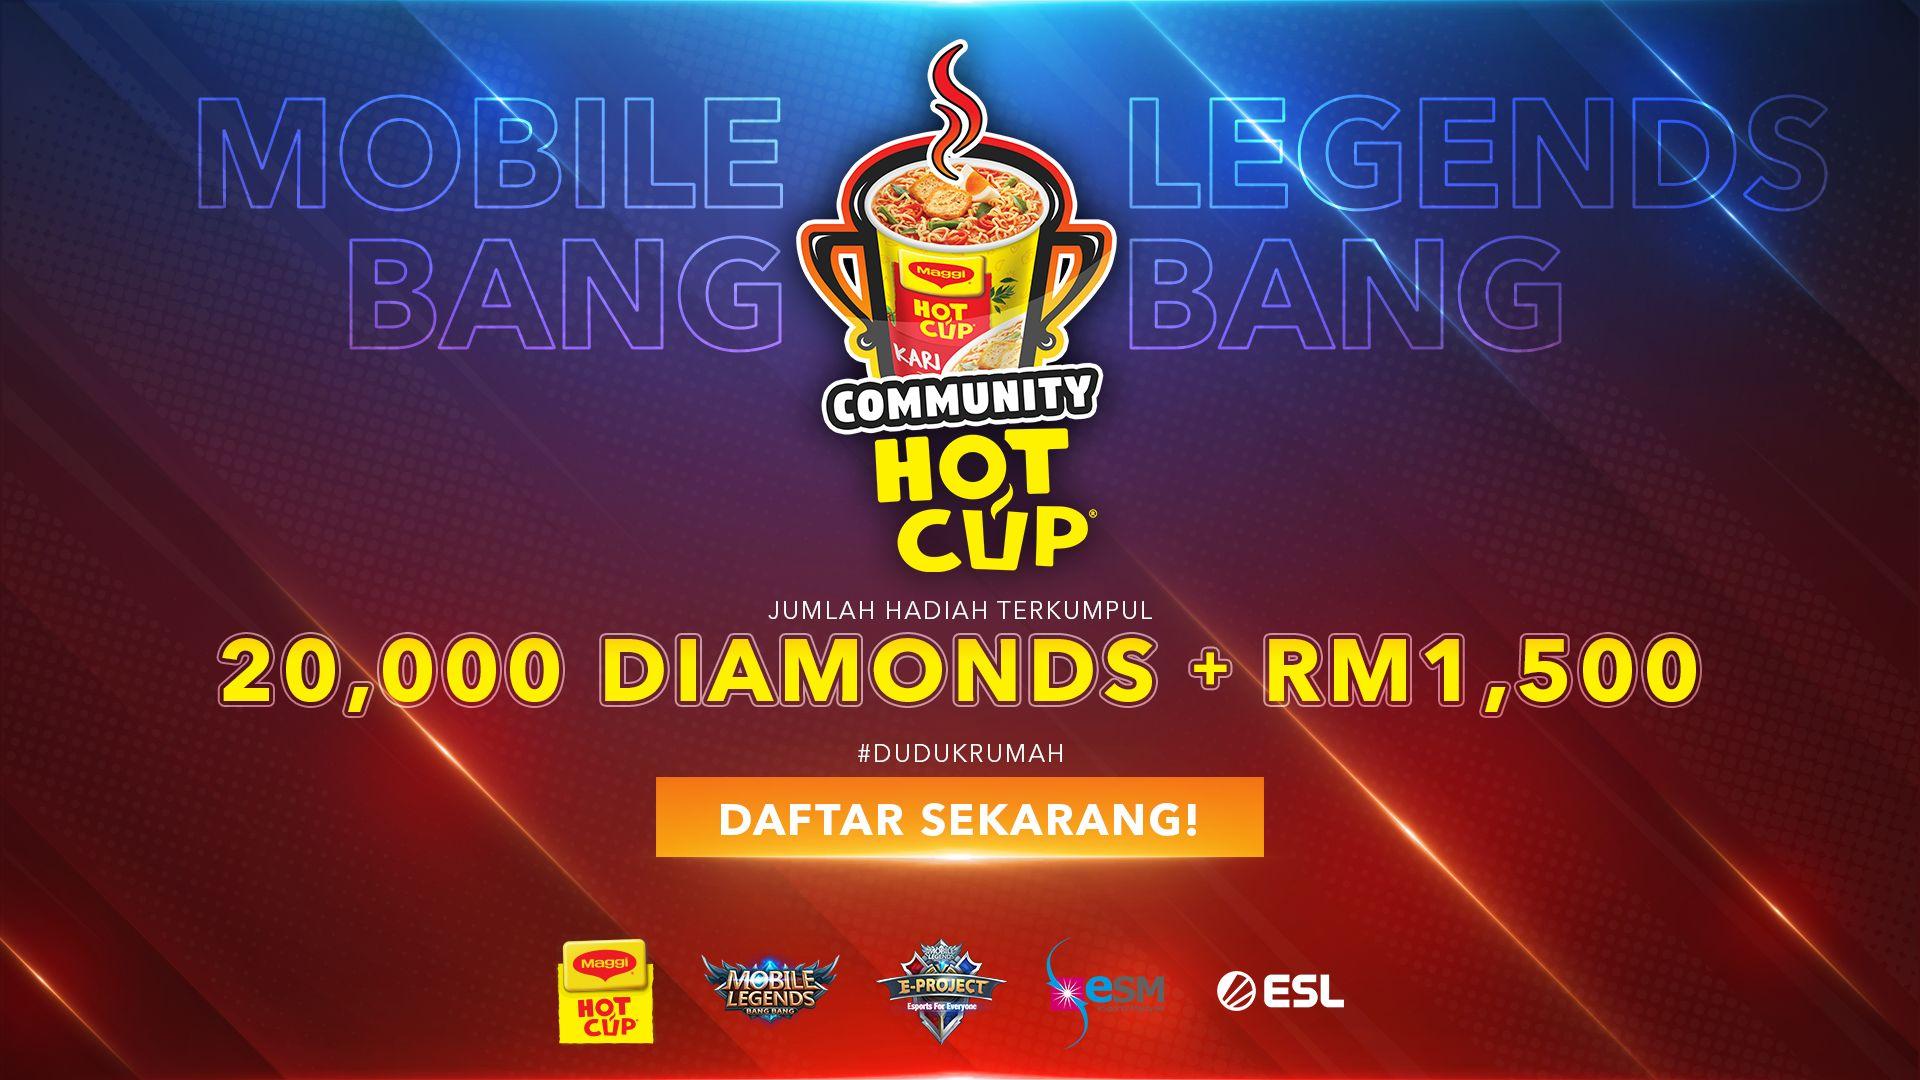 Sertai Kejohanan Komuniti Maggi Hot Cup #DudukRumah – 20,000 Diamonds & RM1,500 Tunai